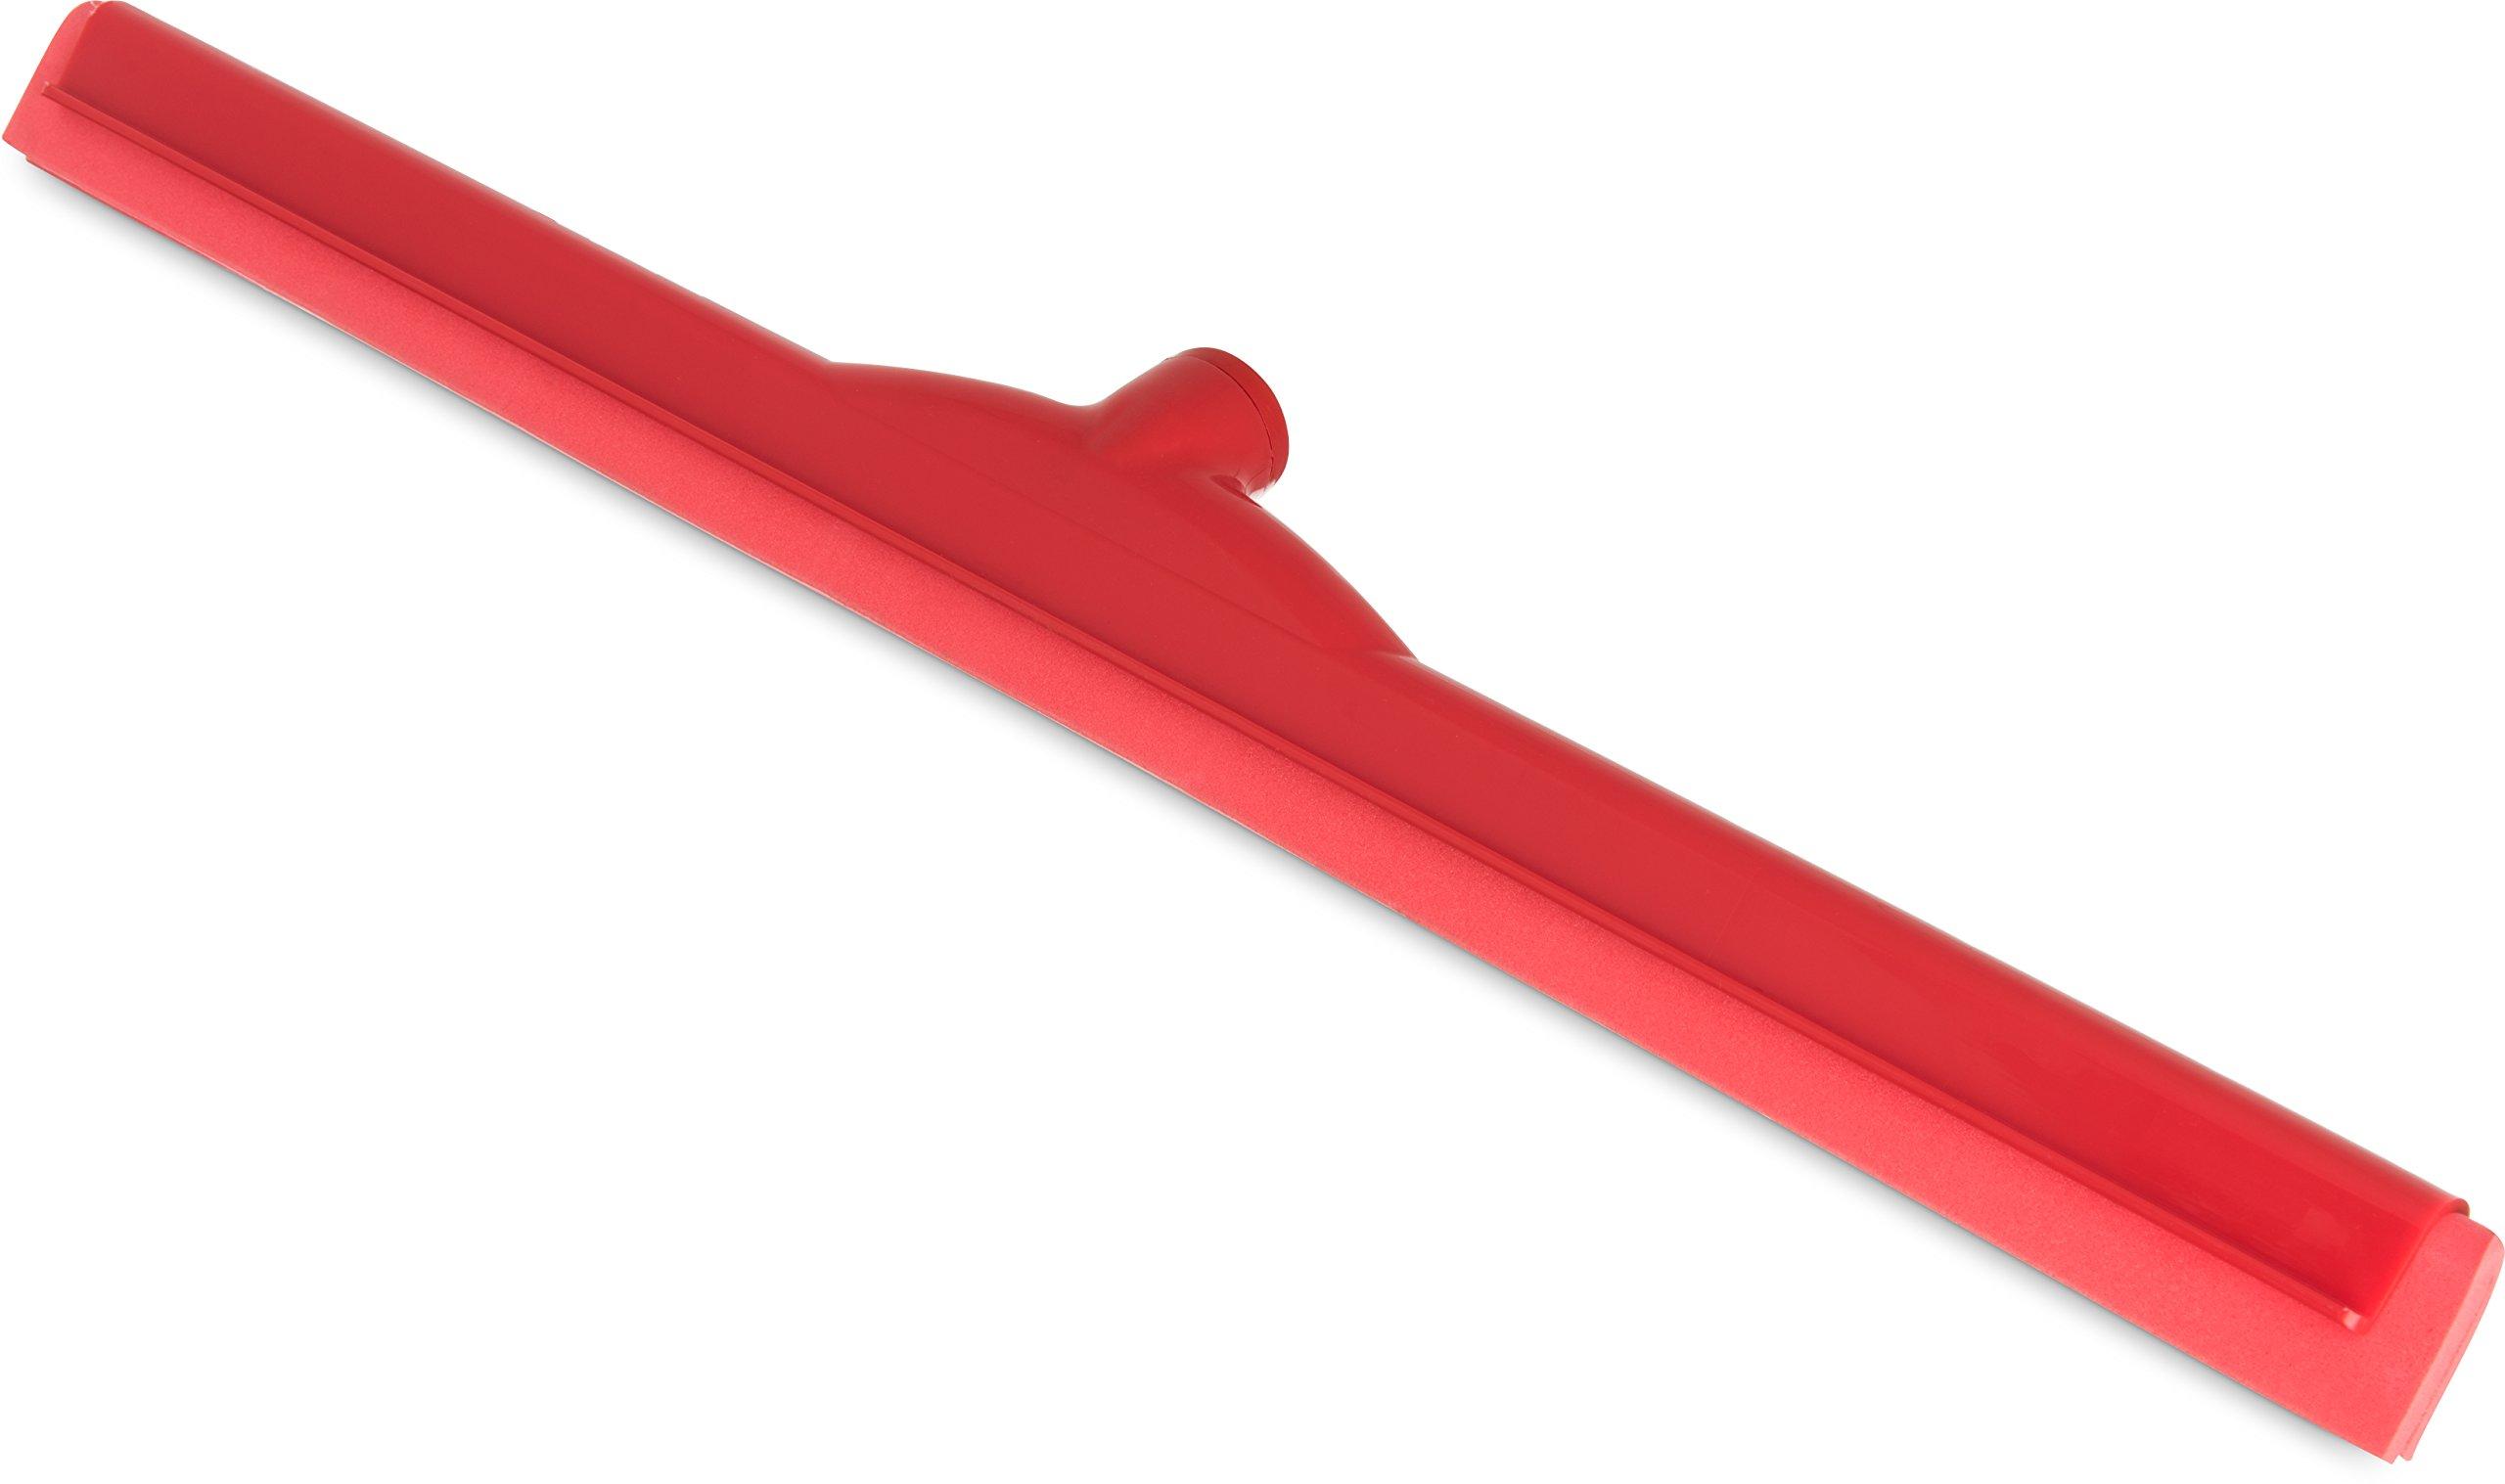 Carlisle 4156805 Spectrum Double Foam Rubber Floor Squeegee, 24'' Width, Red (Case of 6)